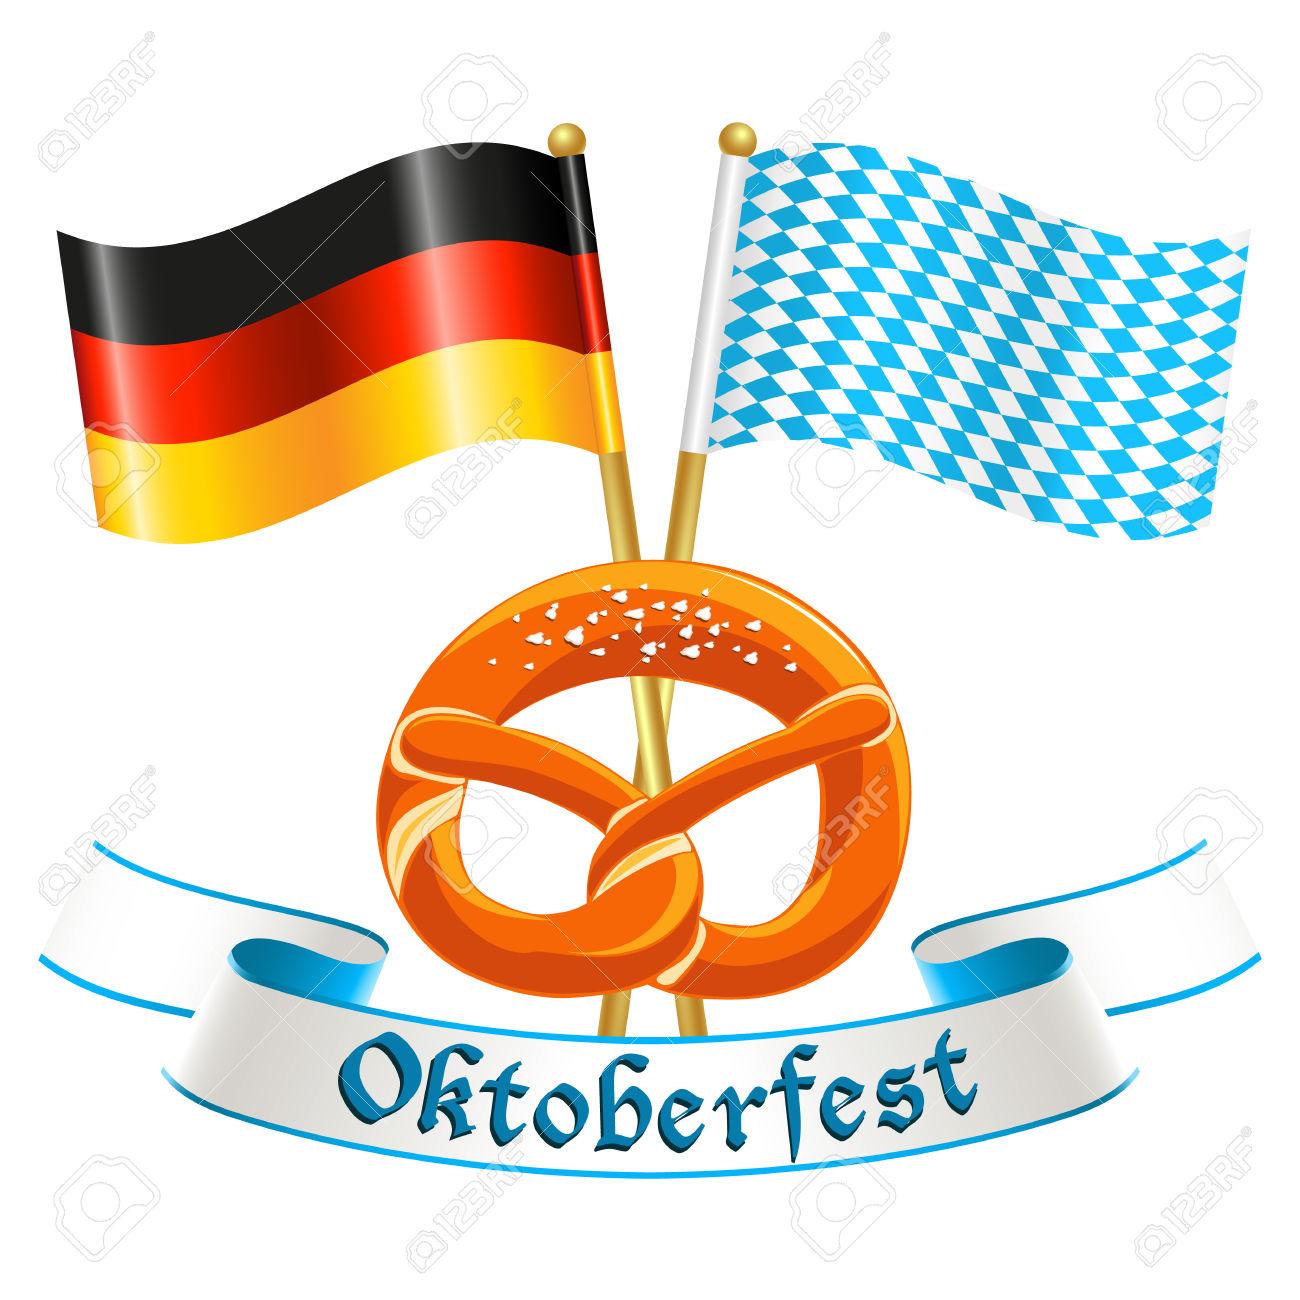 Oktoberfest Celebration Design With Silk Banner, German National.